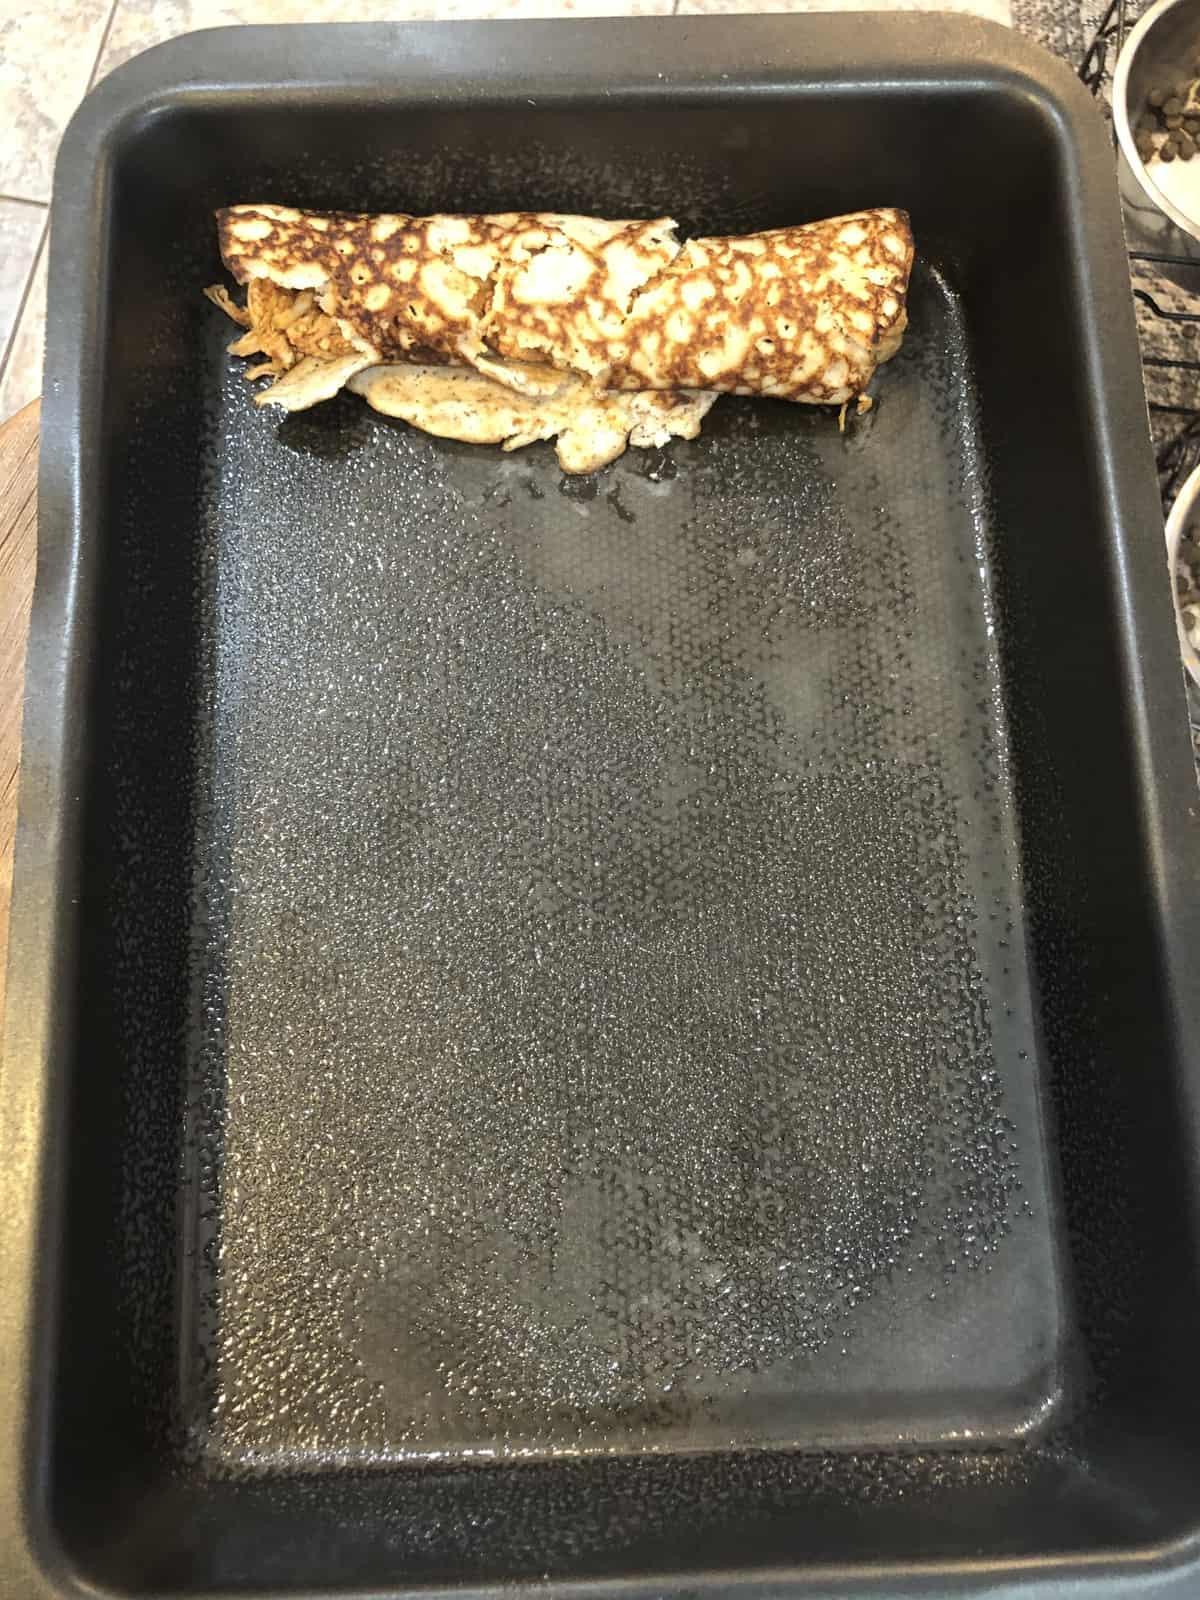 Tortilla in a Baking Pan